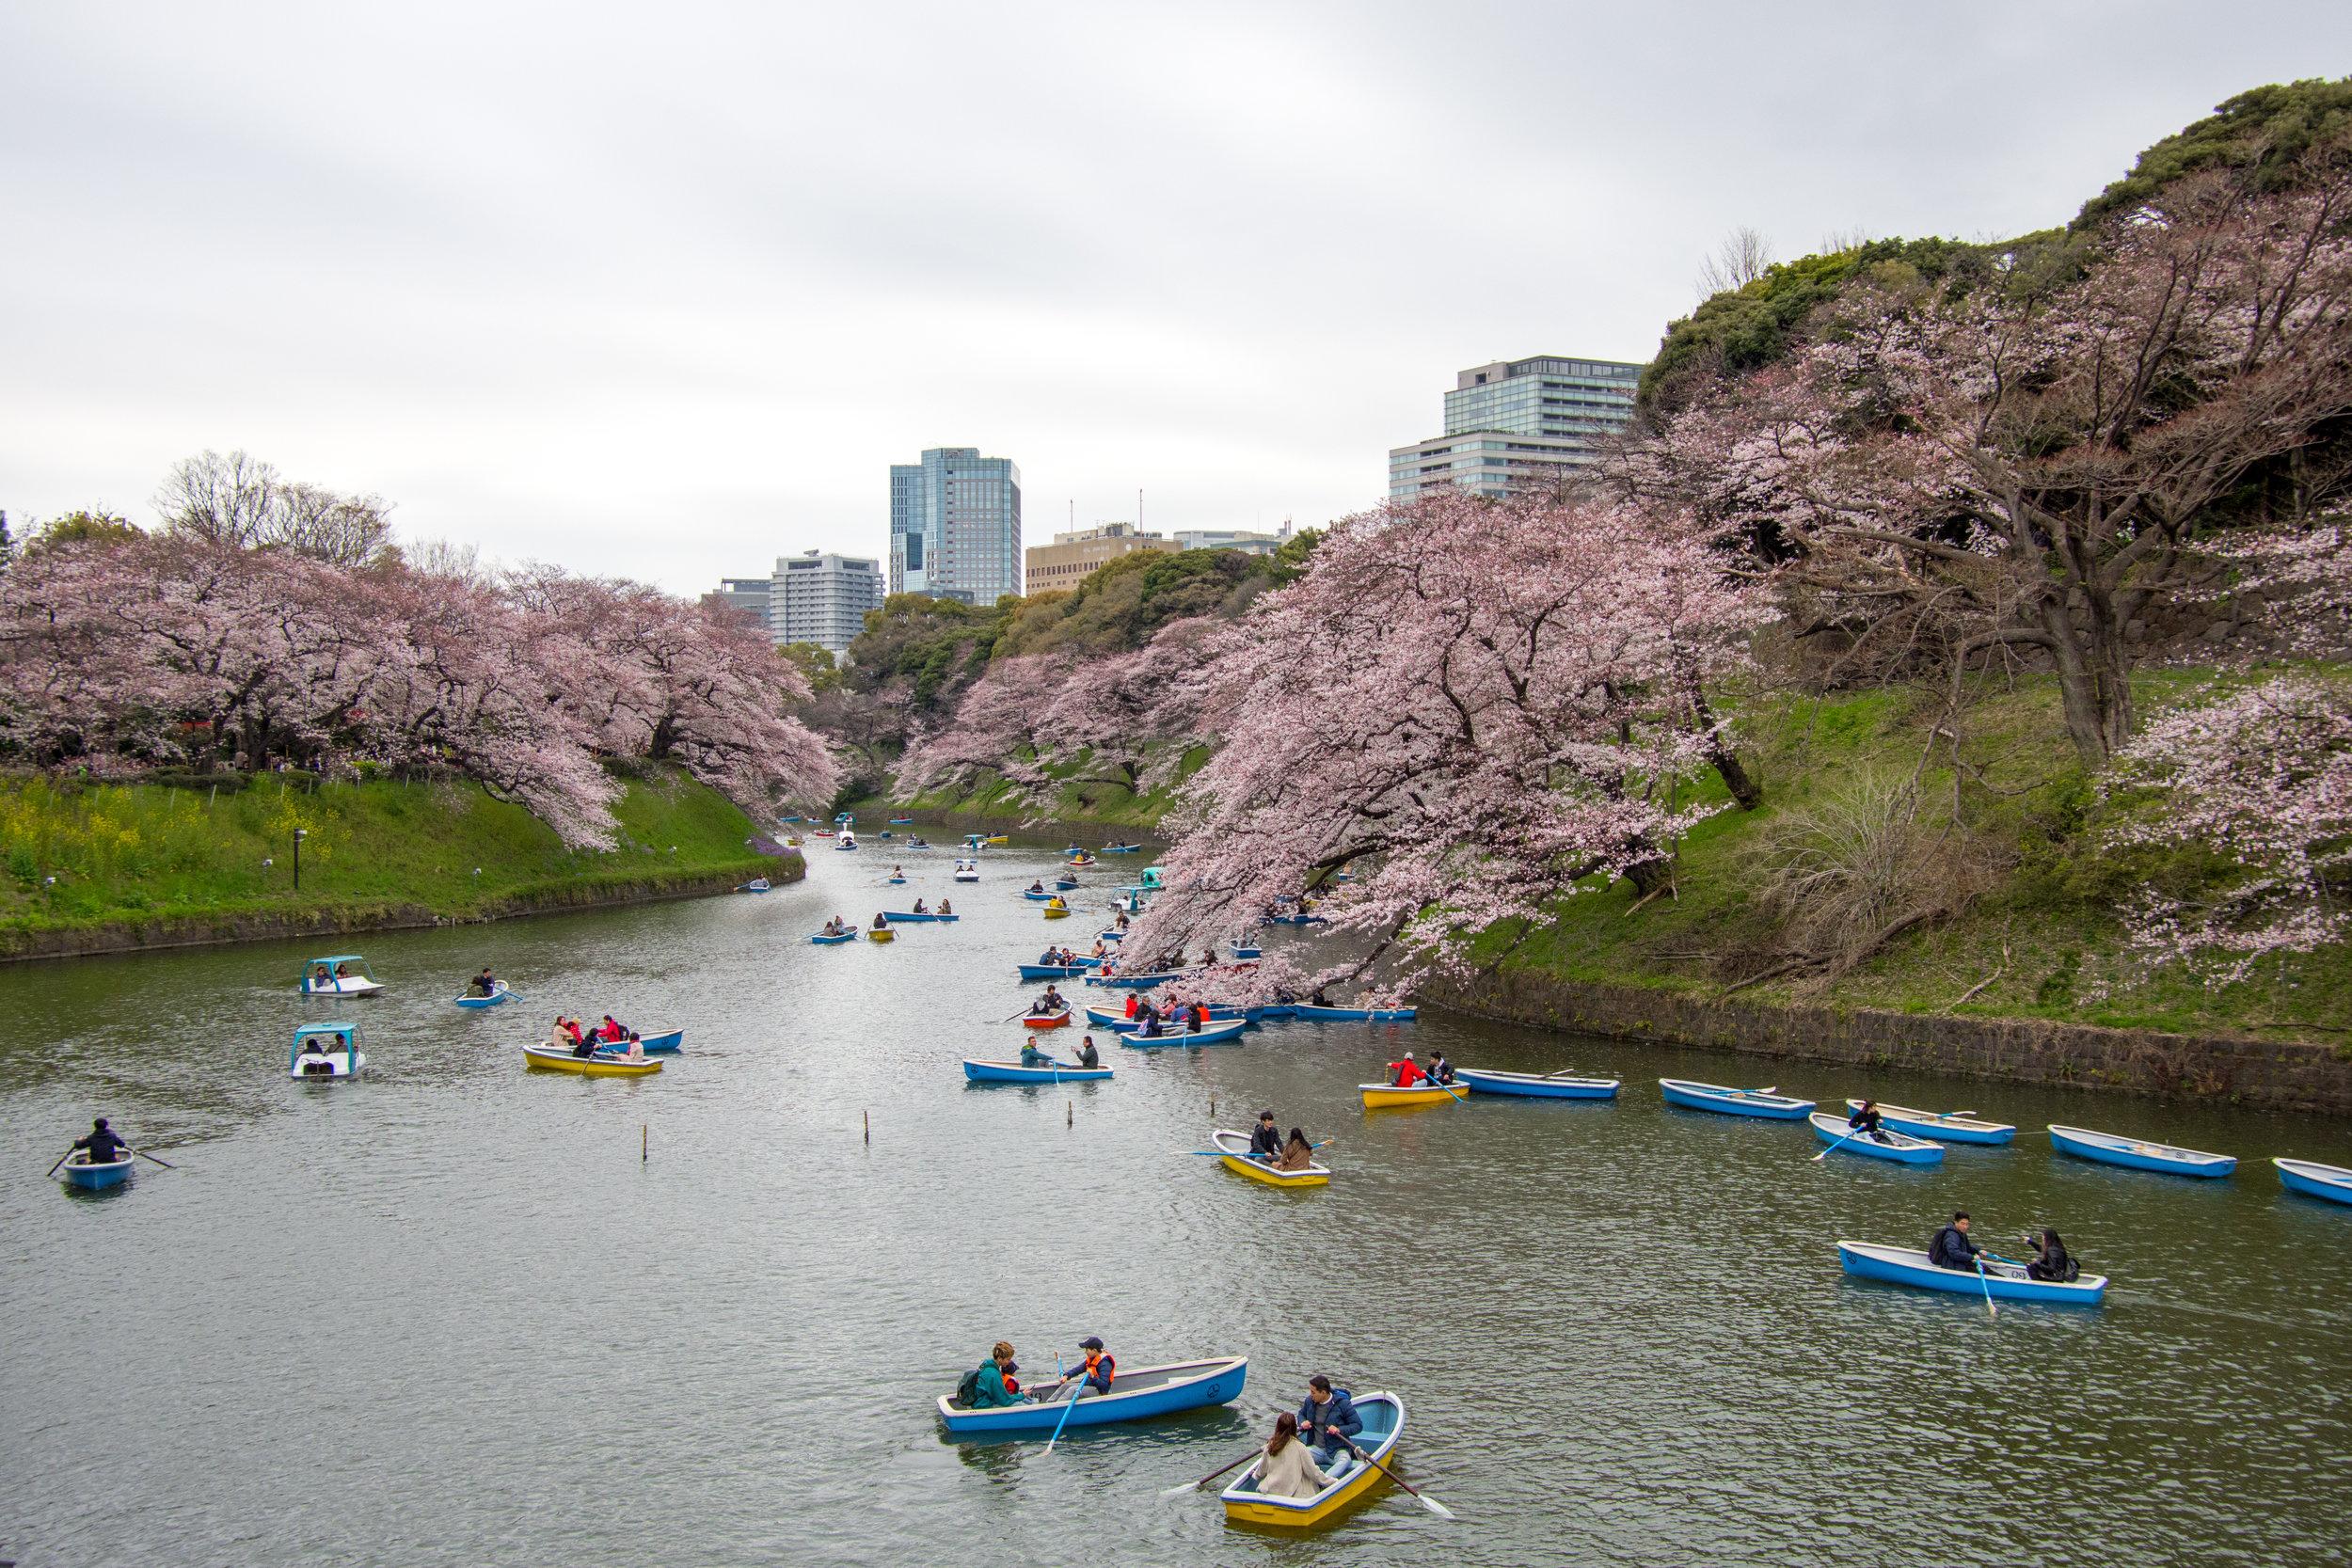 Chidorigafuchi Greenway in Tokyo